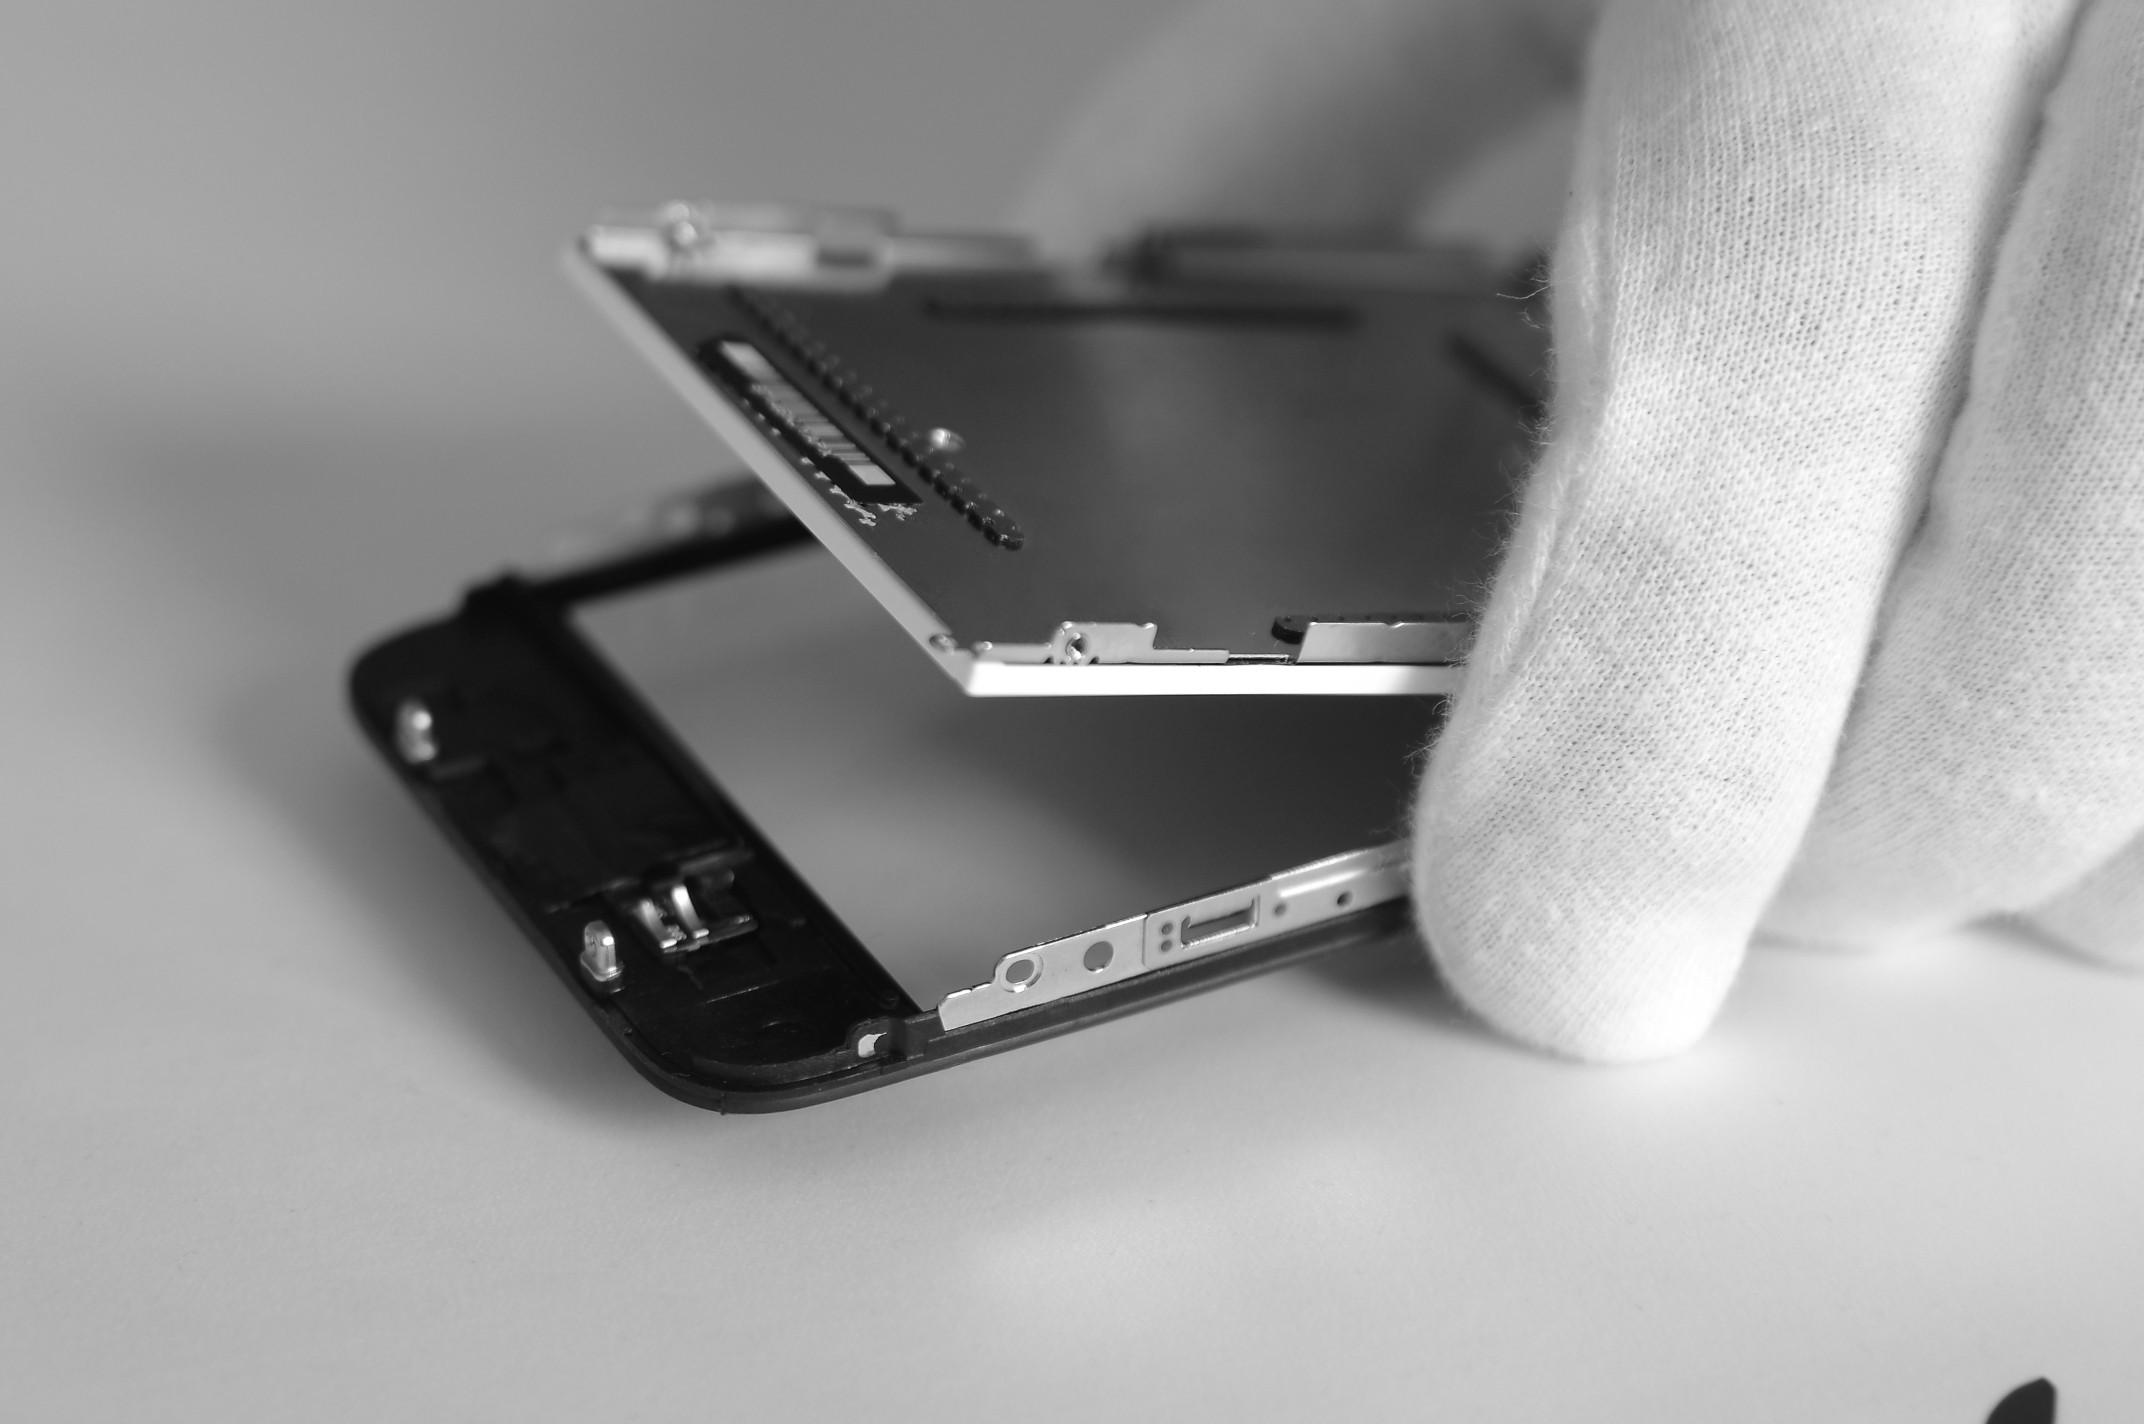 Замена стекла iphone 3gs инструкция